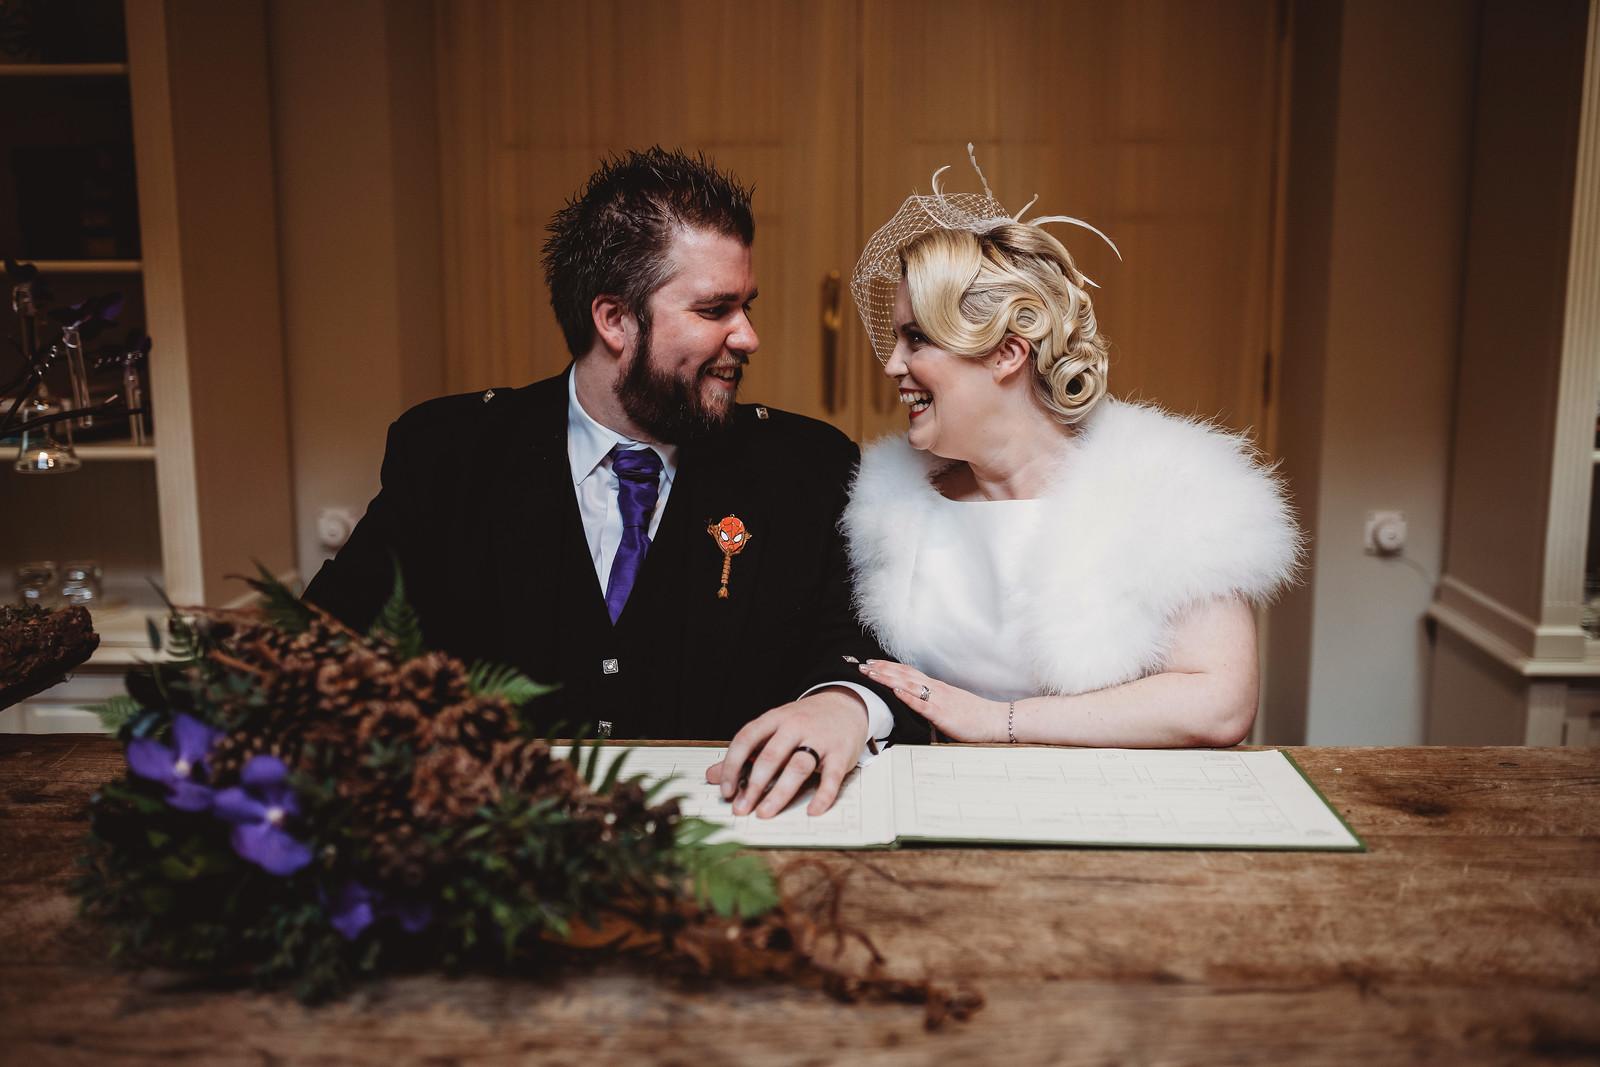 Bride and good wedding photo